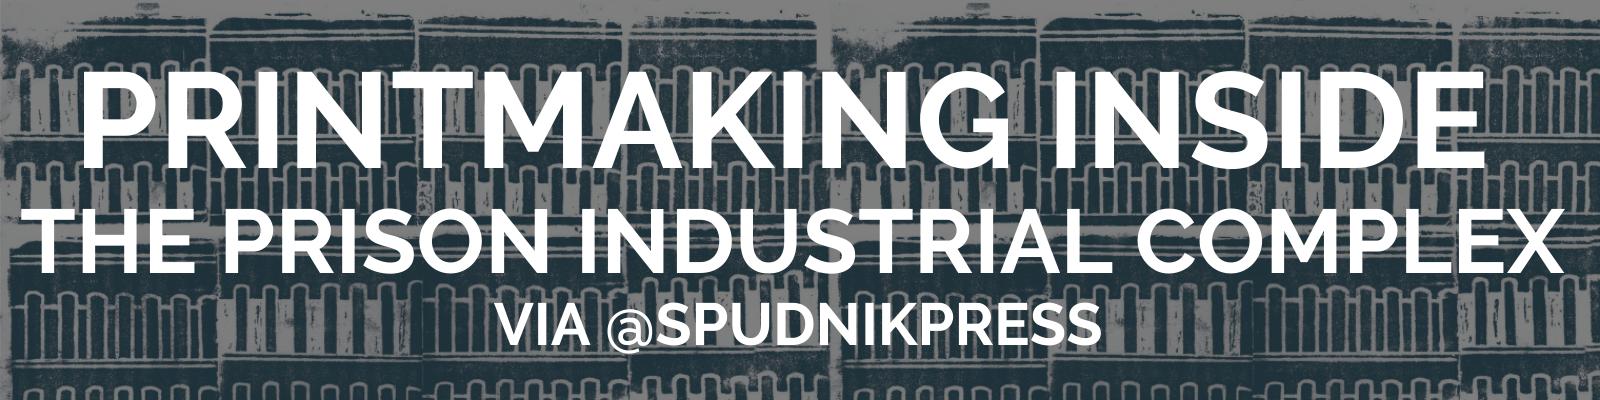 spudnik press - virtual event - artist talk - printmaking inside the prison industrial complex with aaron hughes - chicago print studio